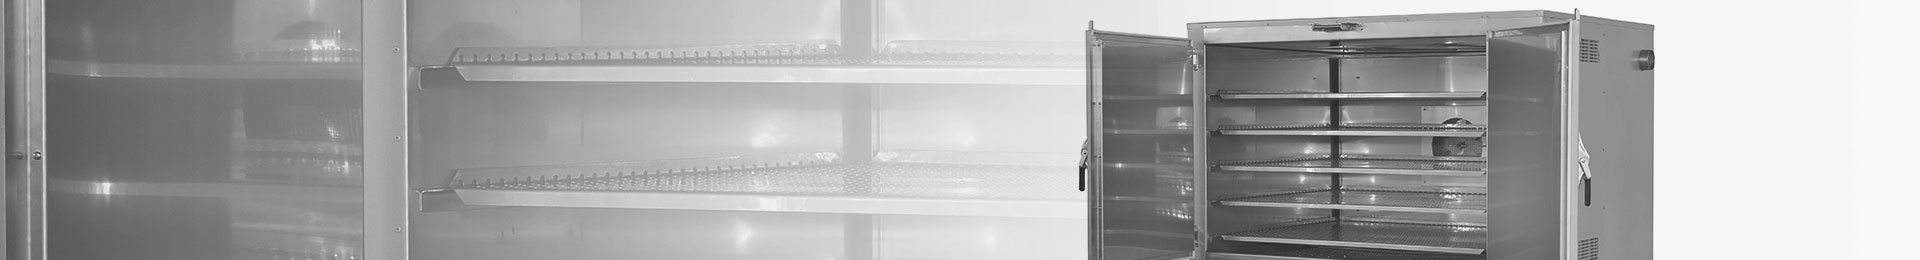 The optimum heating chamber or your ideal heating cabinet - HORO has it._Headerbild